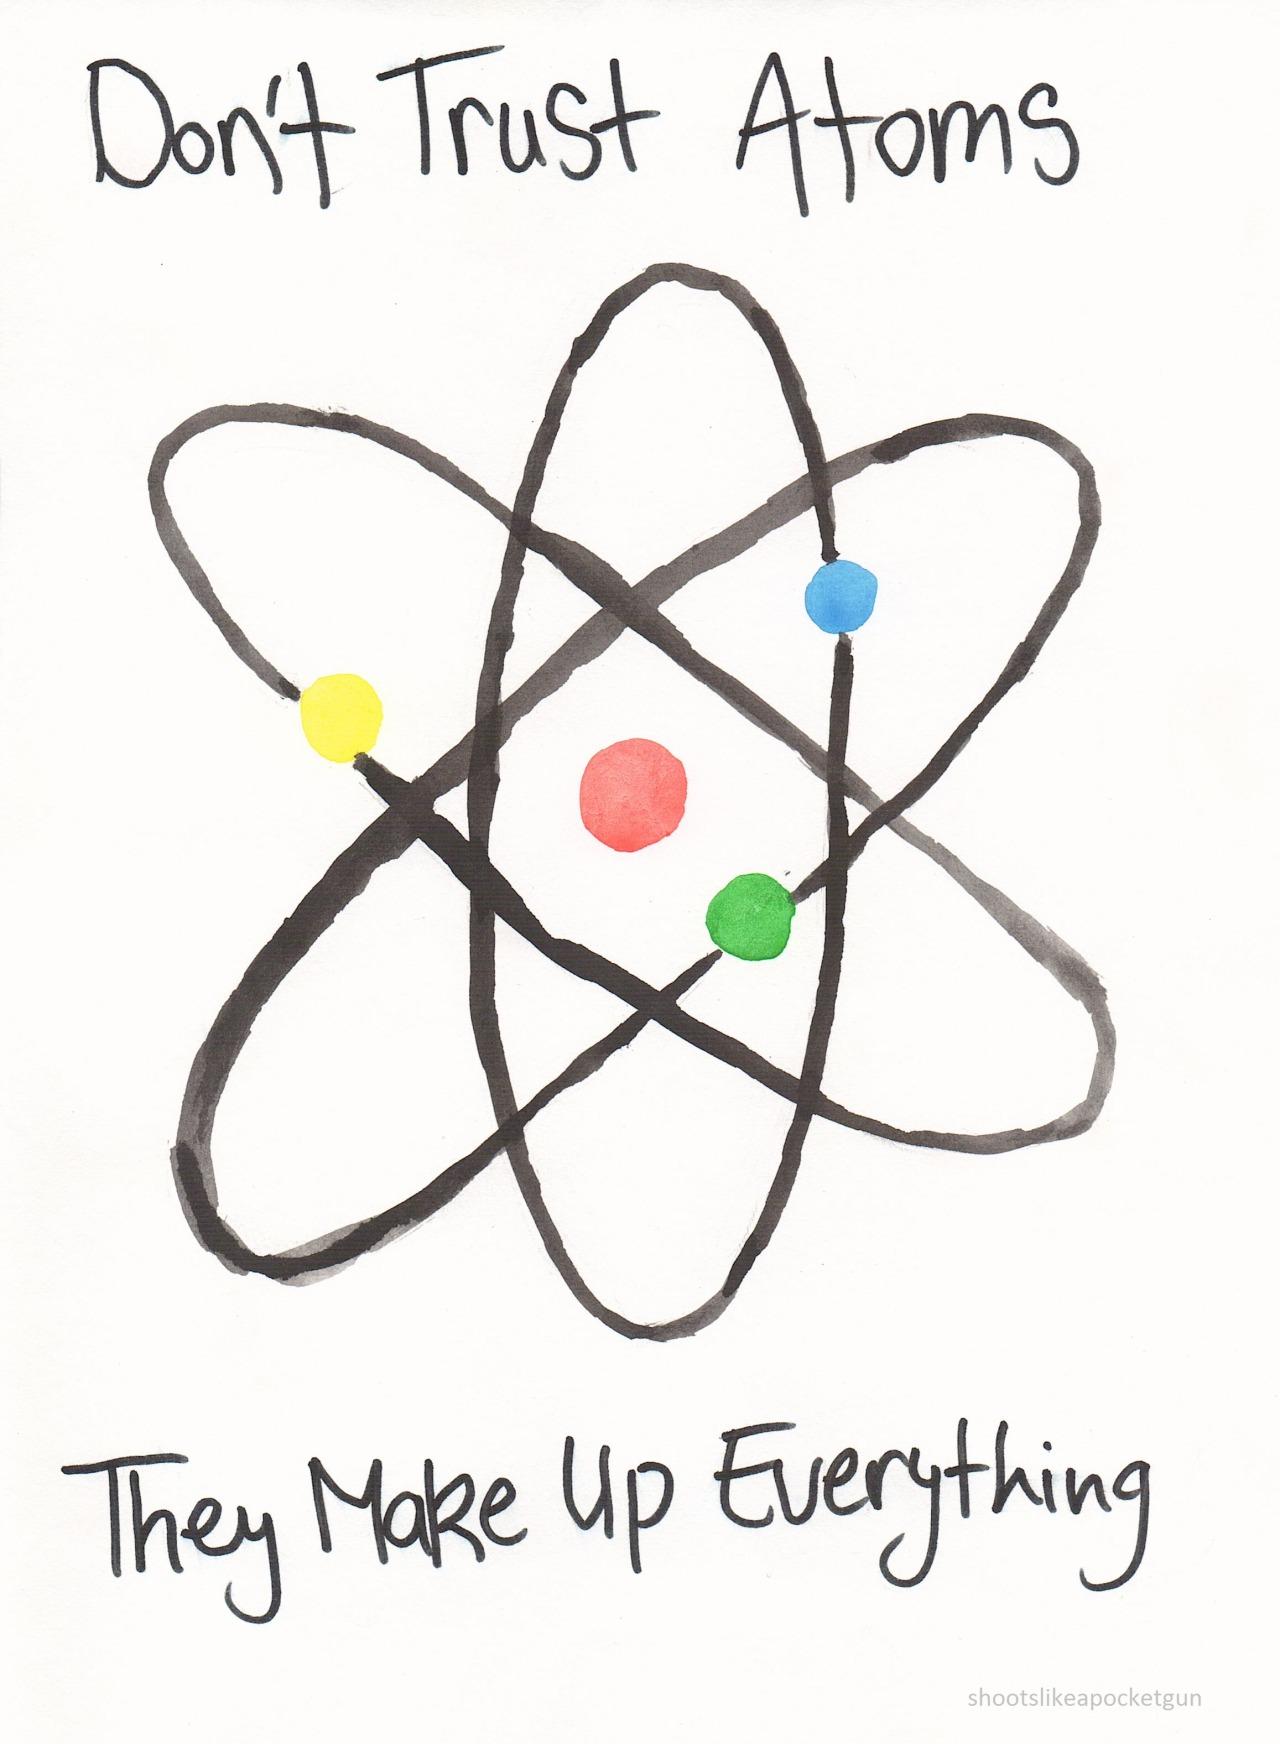 don't trust atoms : Punny